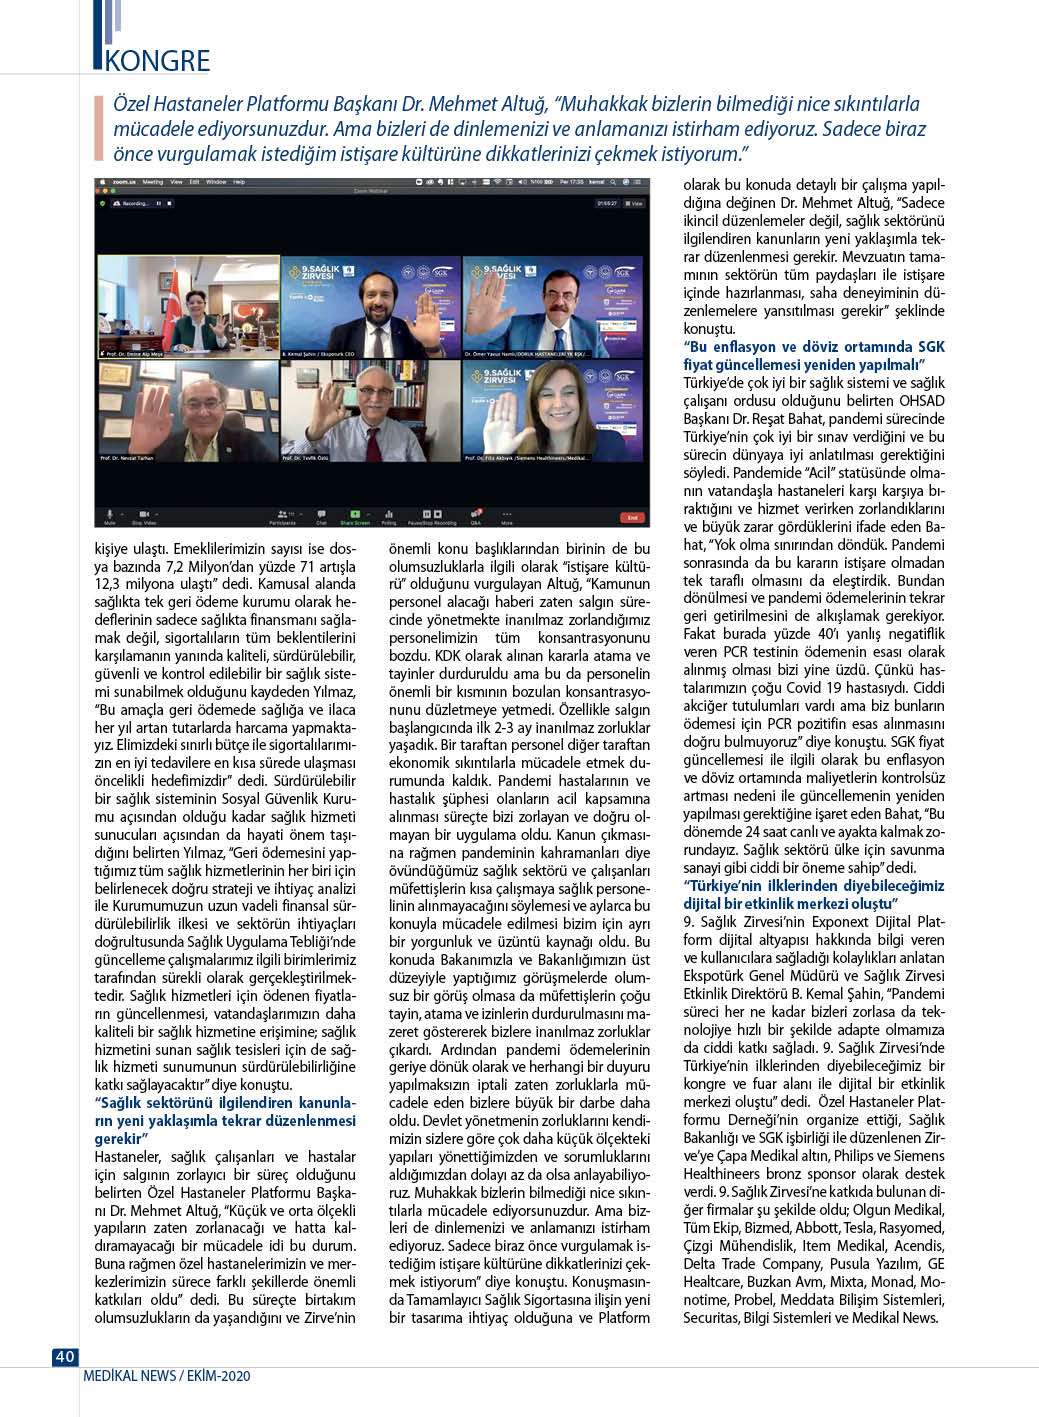 Medikal-News-Ekim-2020-Sirali-40-1